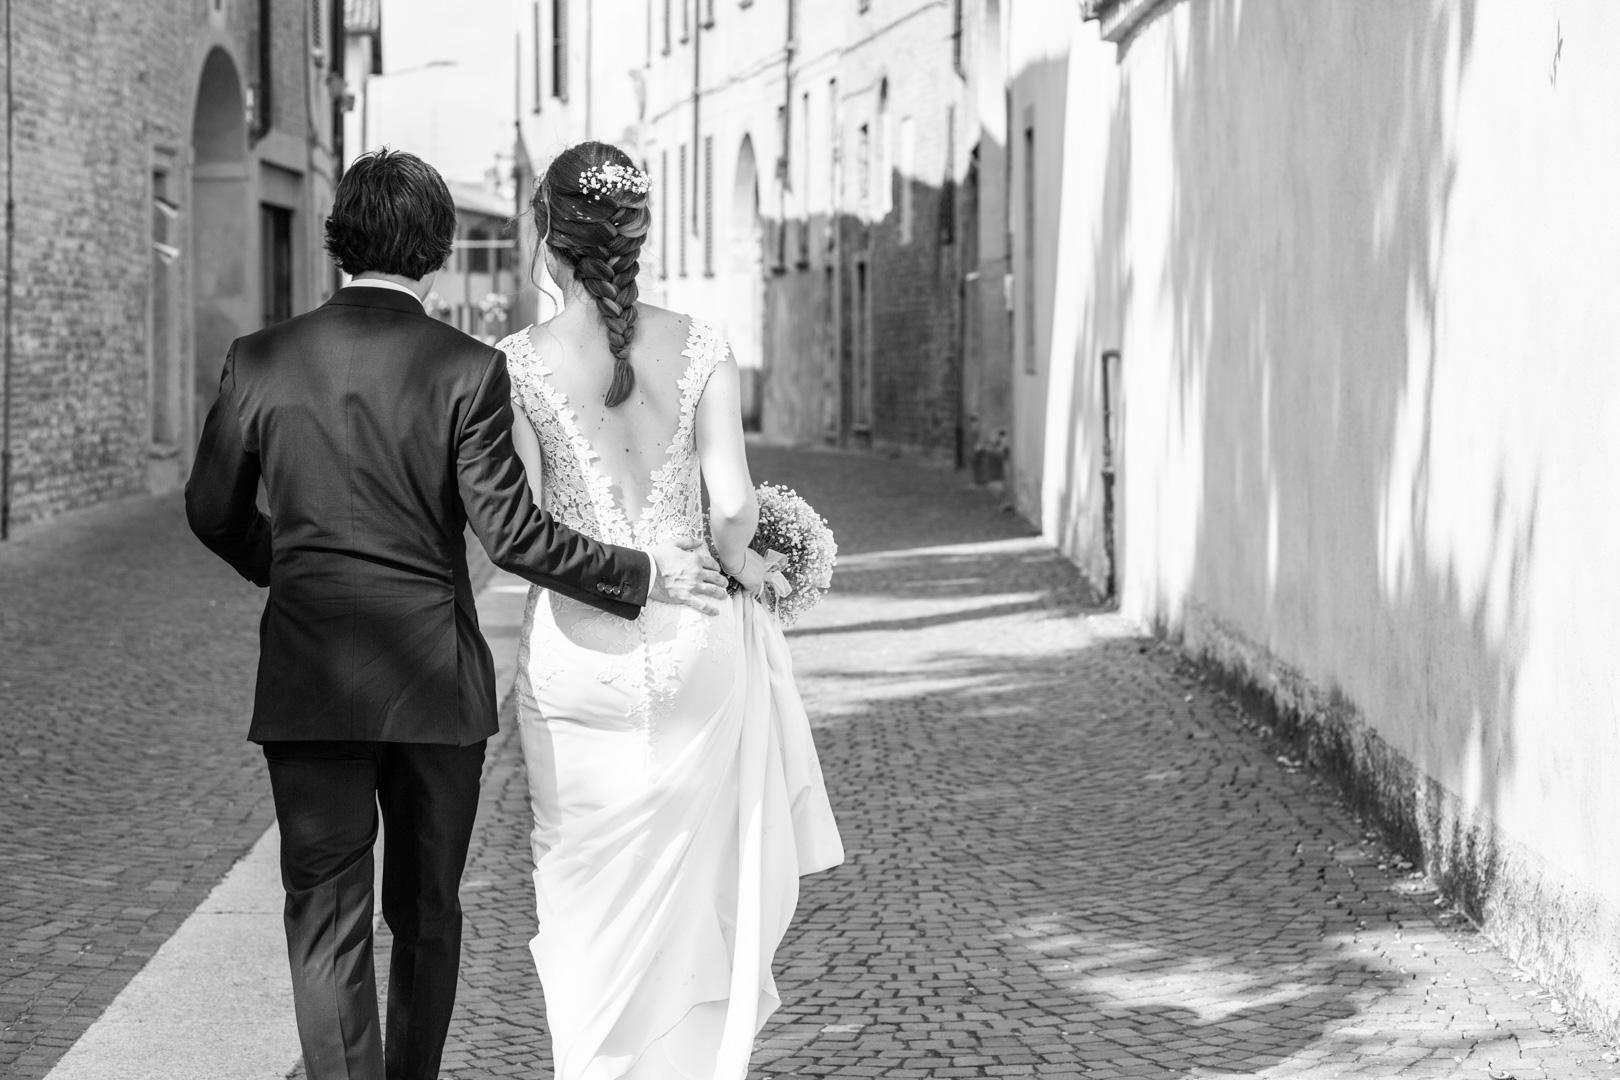 Andreas_Pinacci_Wedding_Photographer-13.